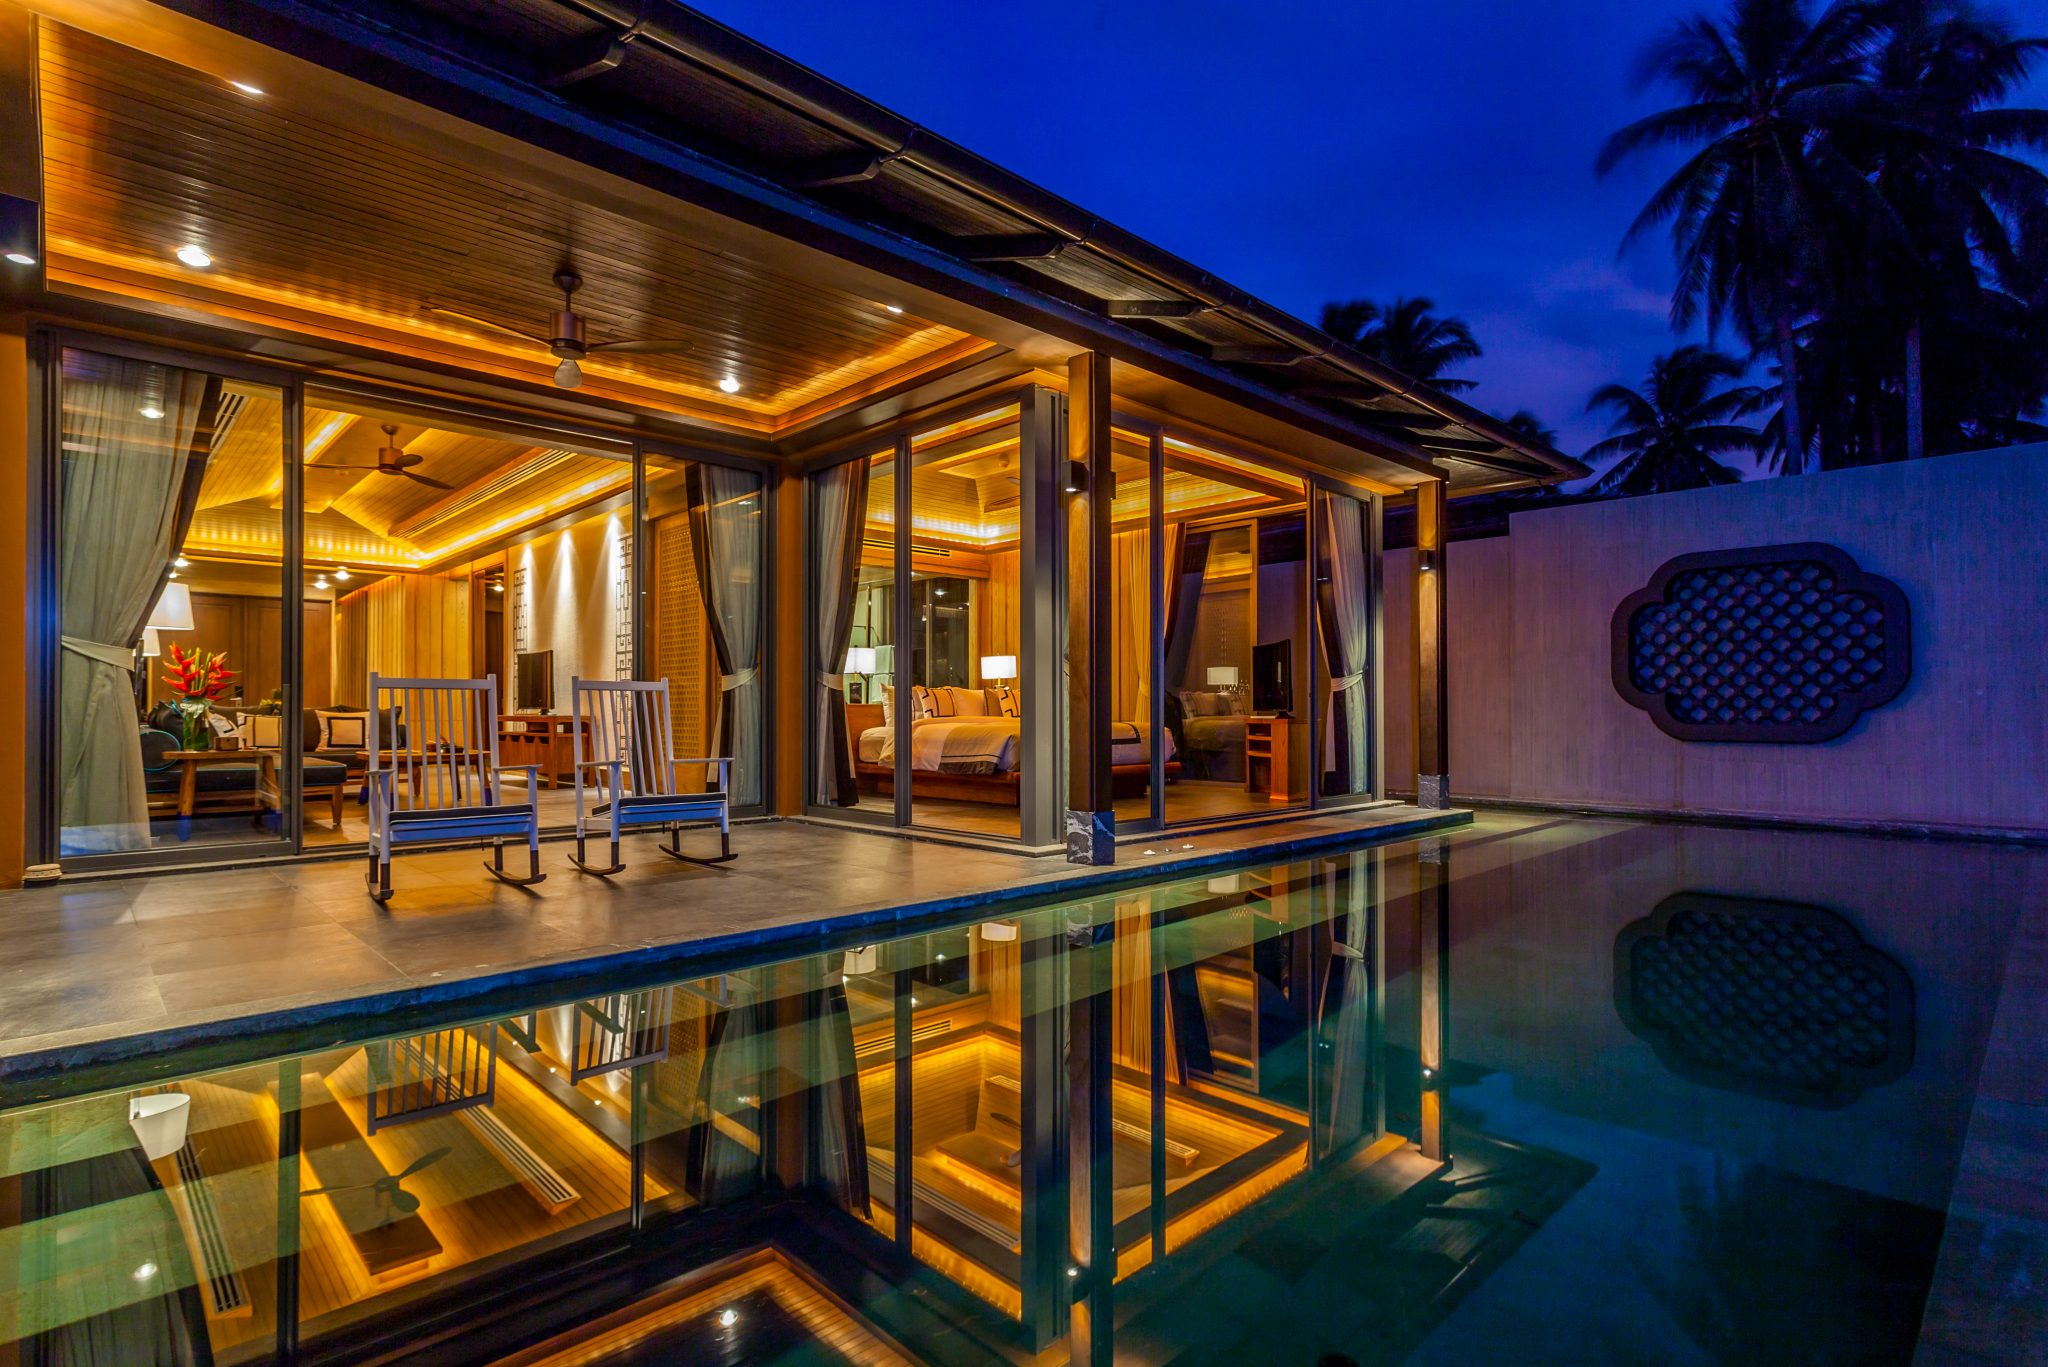 Phuket Real Estate Agency – Natai Beach (2)